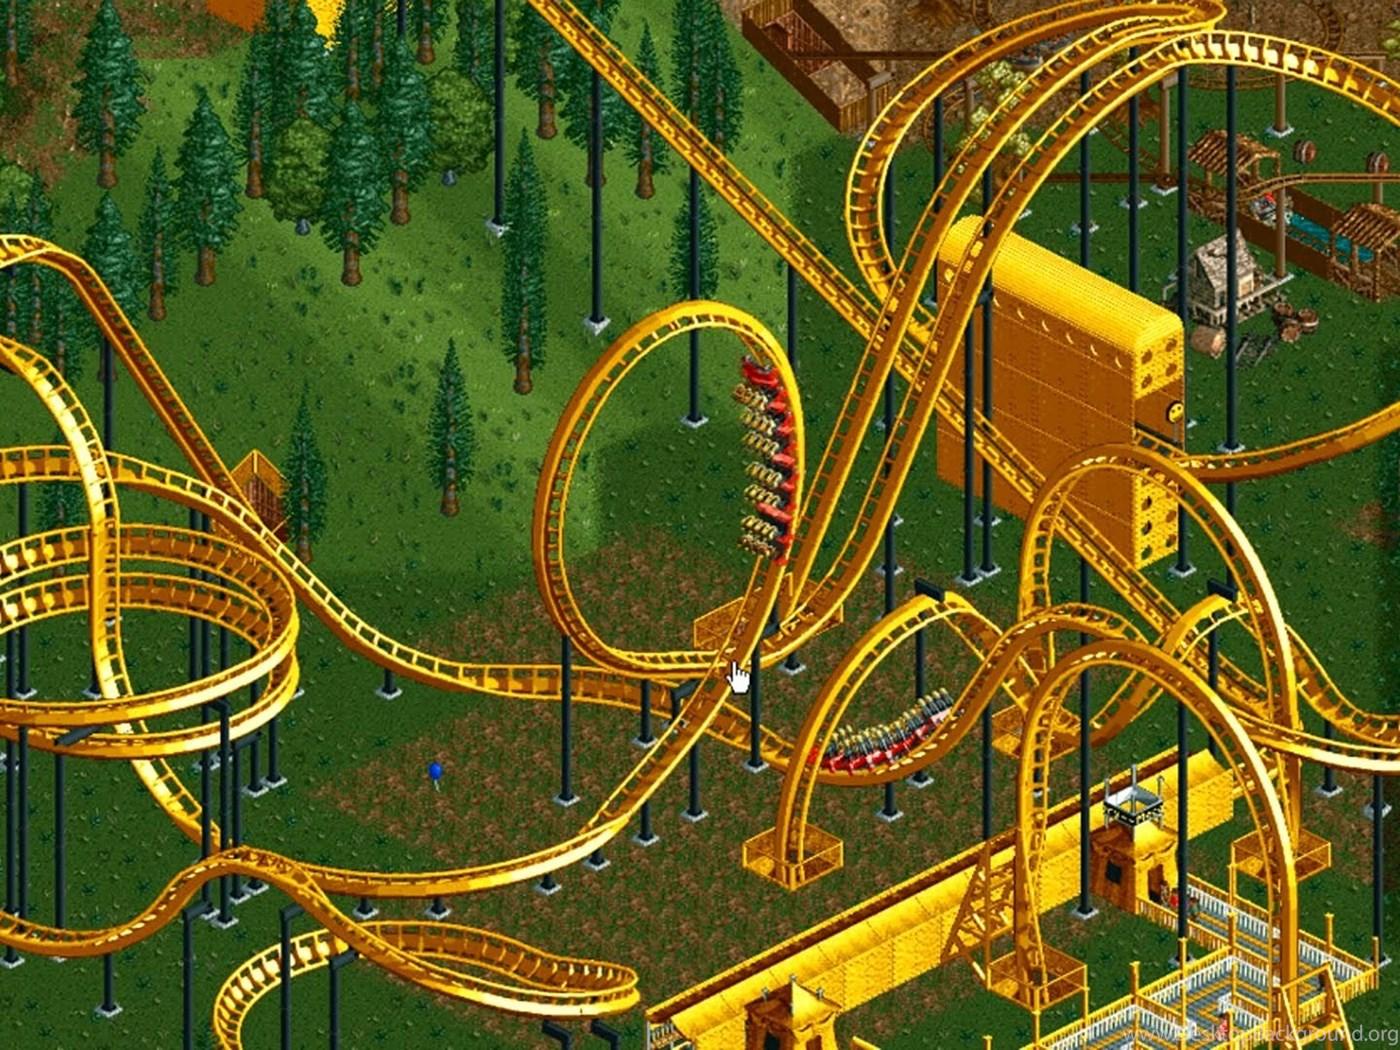 rollercoaster tycoon 2 wallpapers desktop background